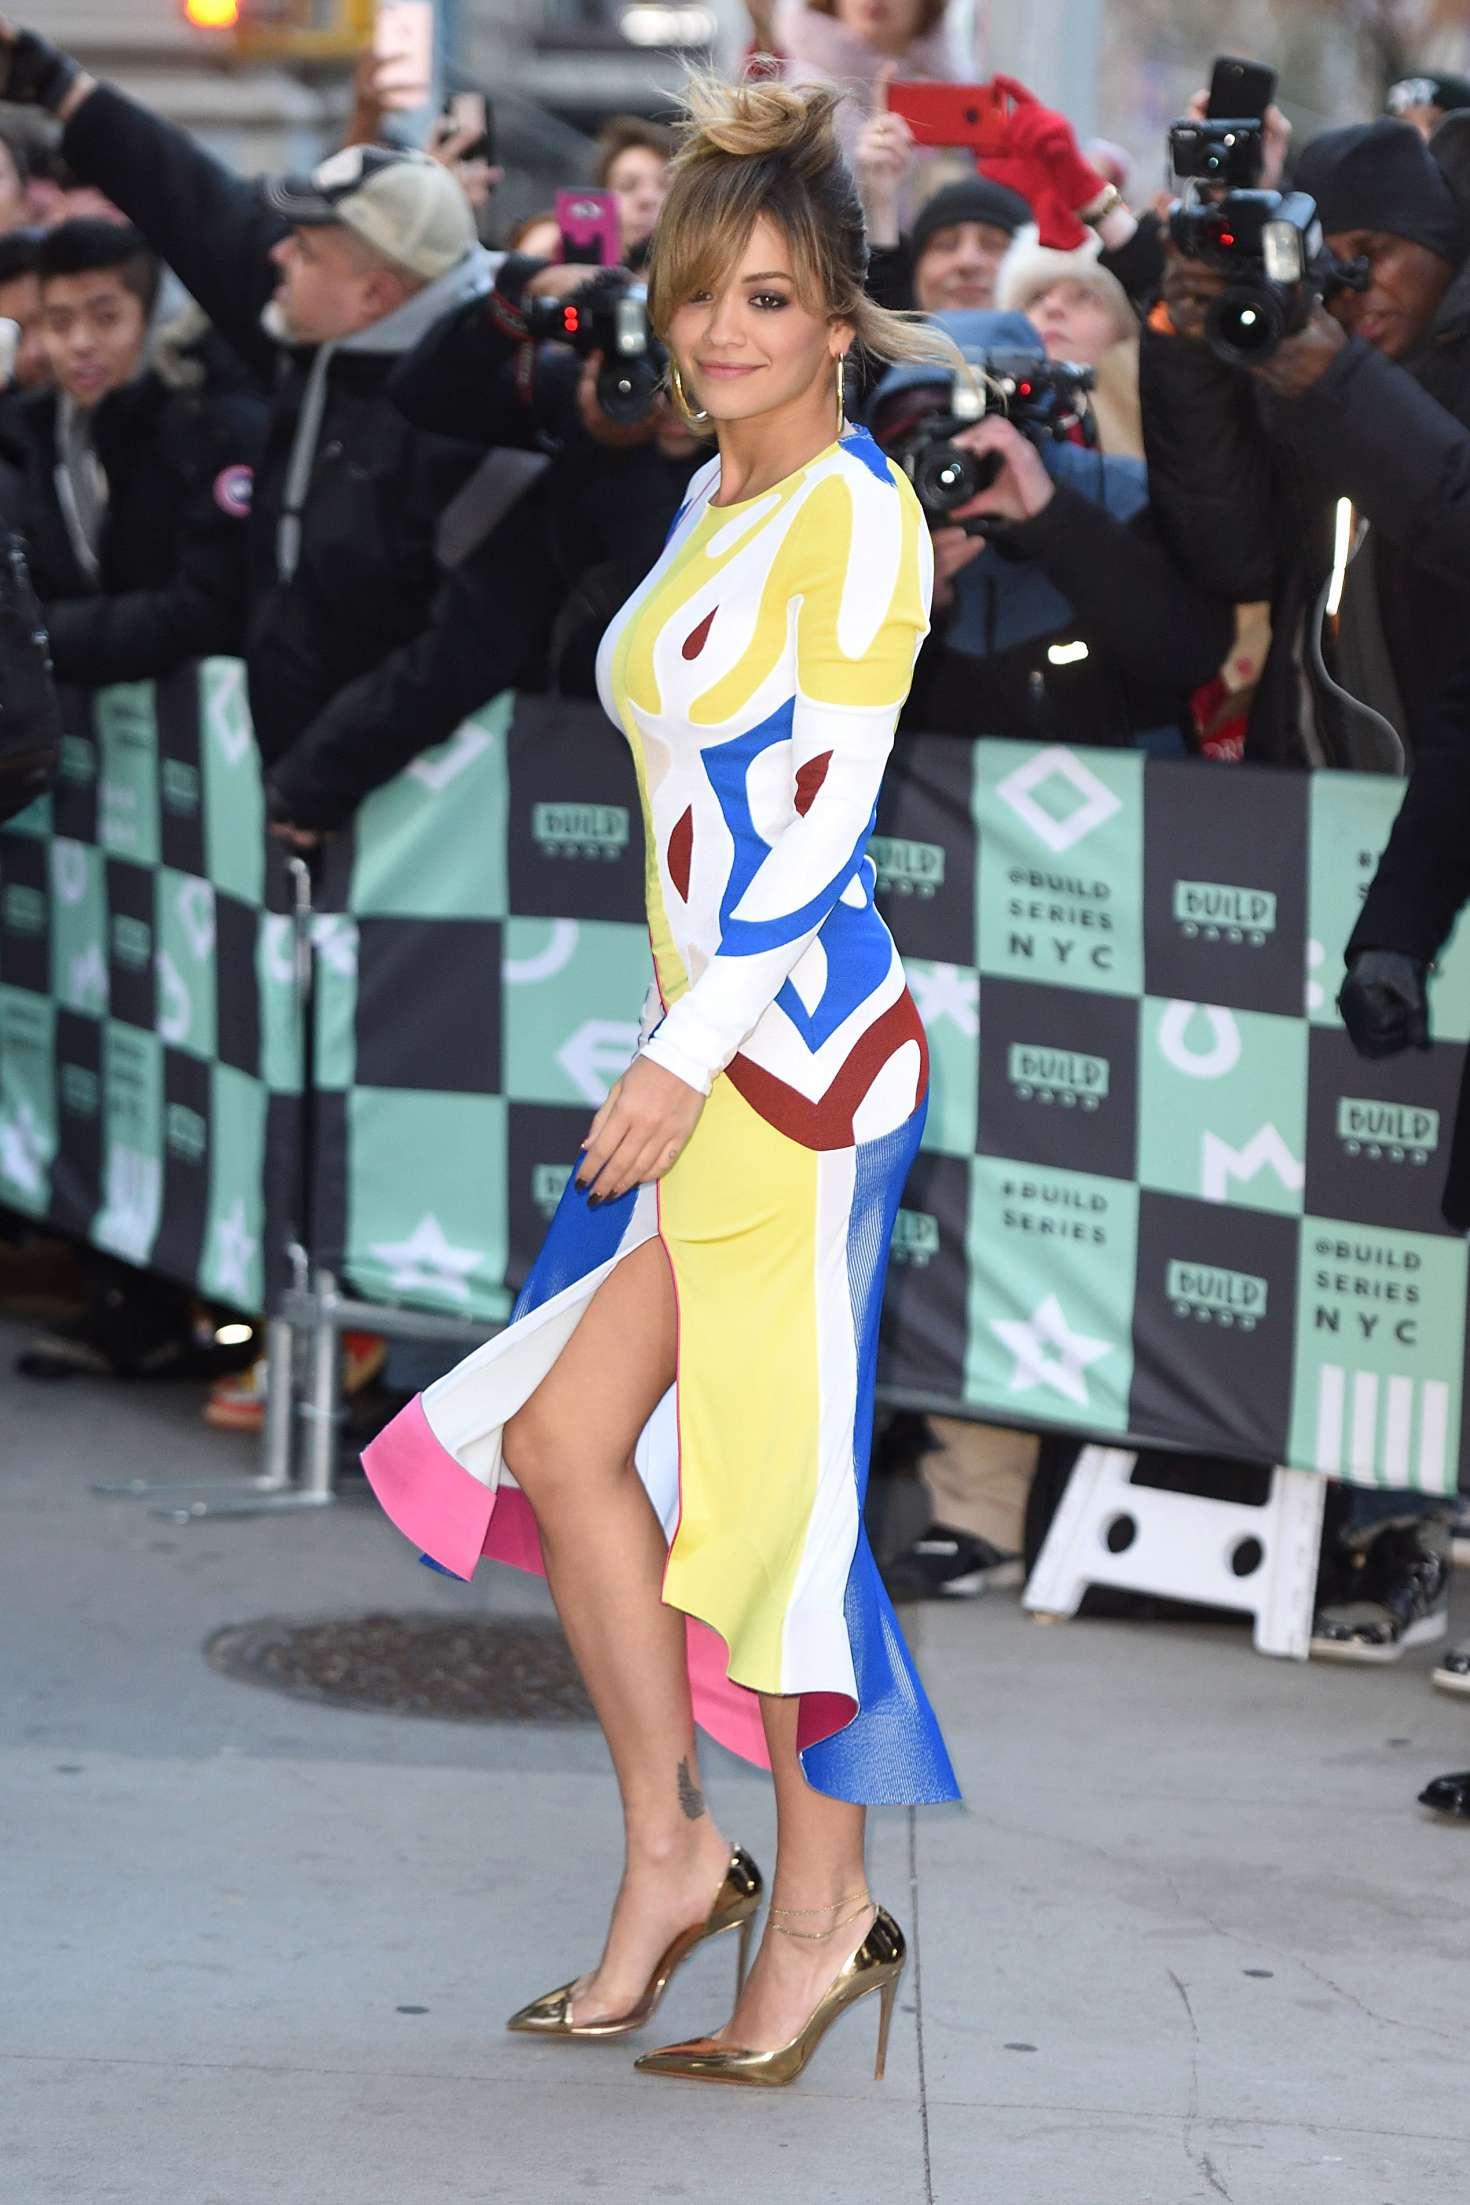 Rita Ora 2017 : Rita Ora: Arrives at AOL Build in NYC -04